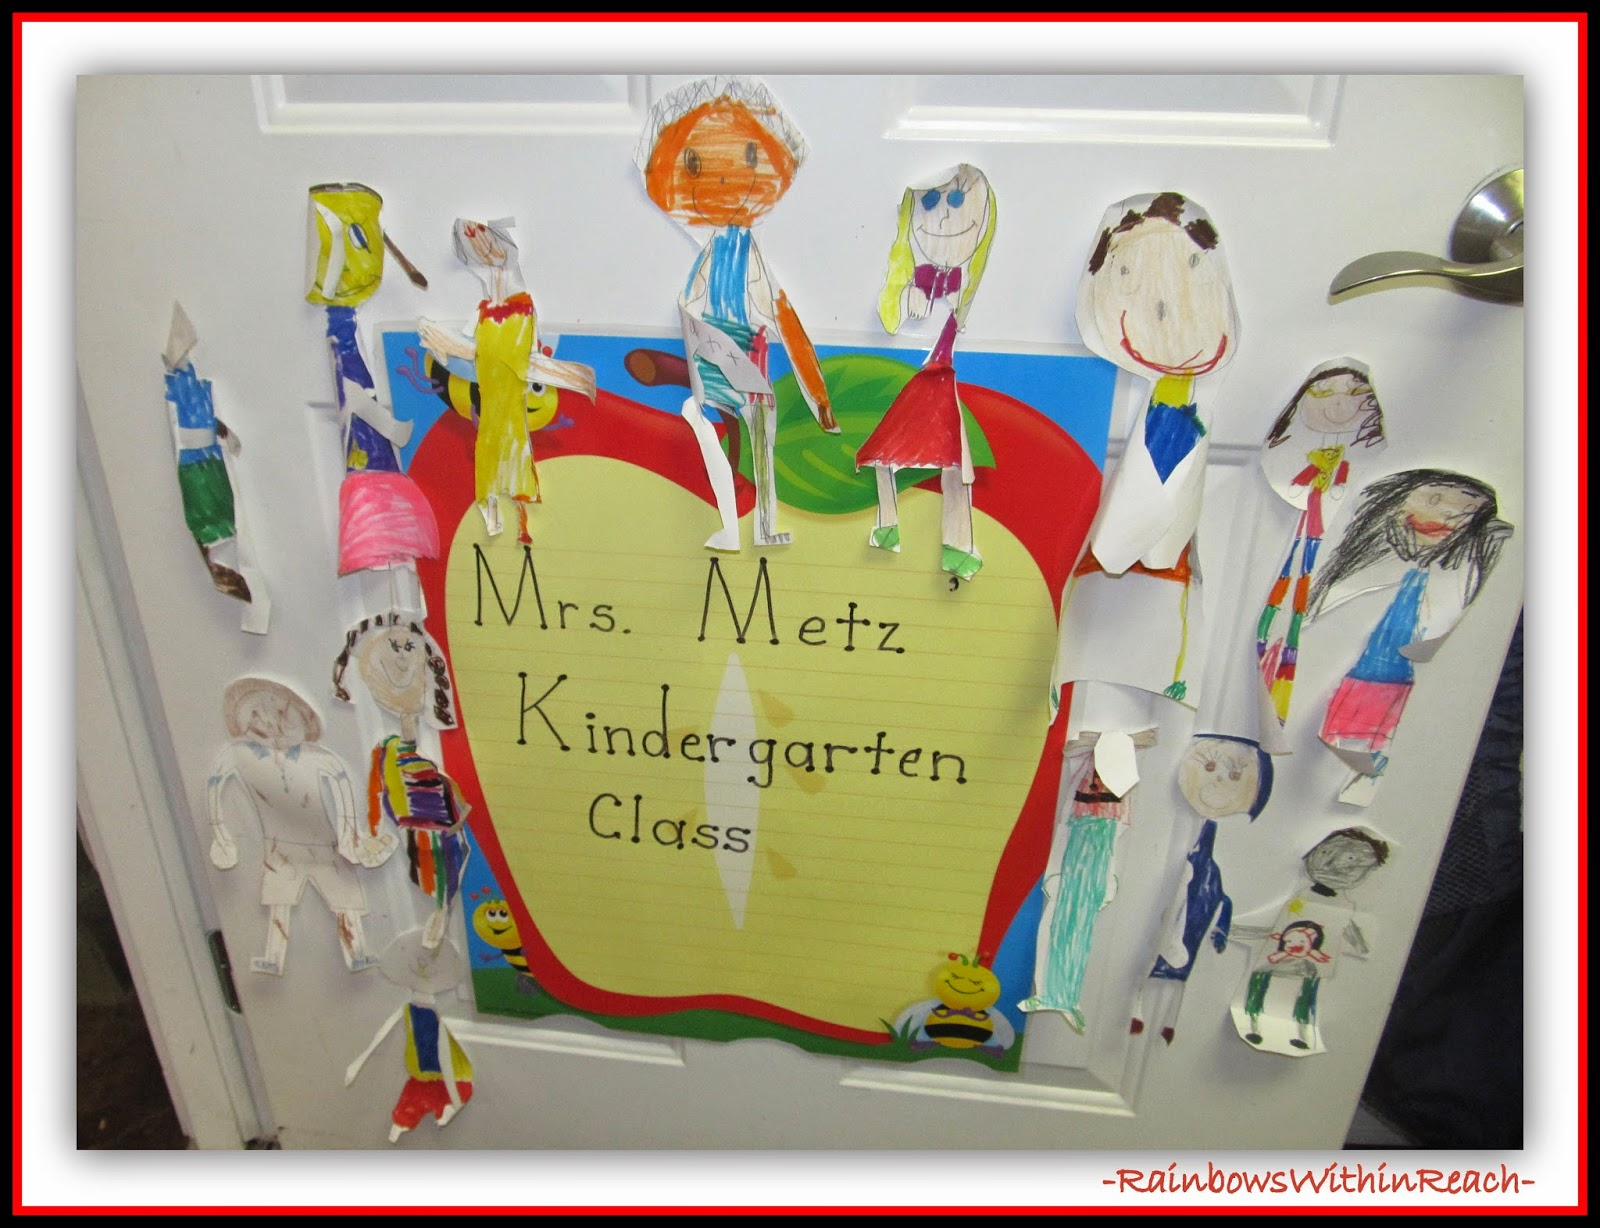 back to school bulletin boards  classroom doors at rainbowswithinreach also rainbowswithinreachspot rh